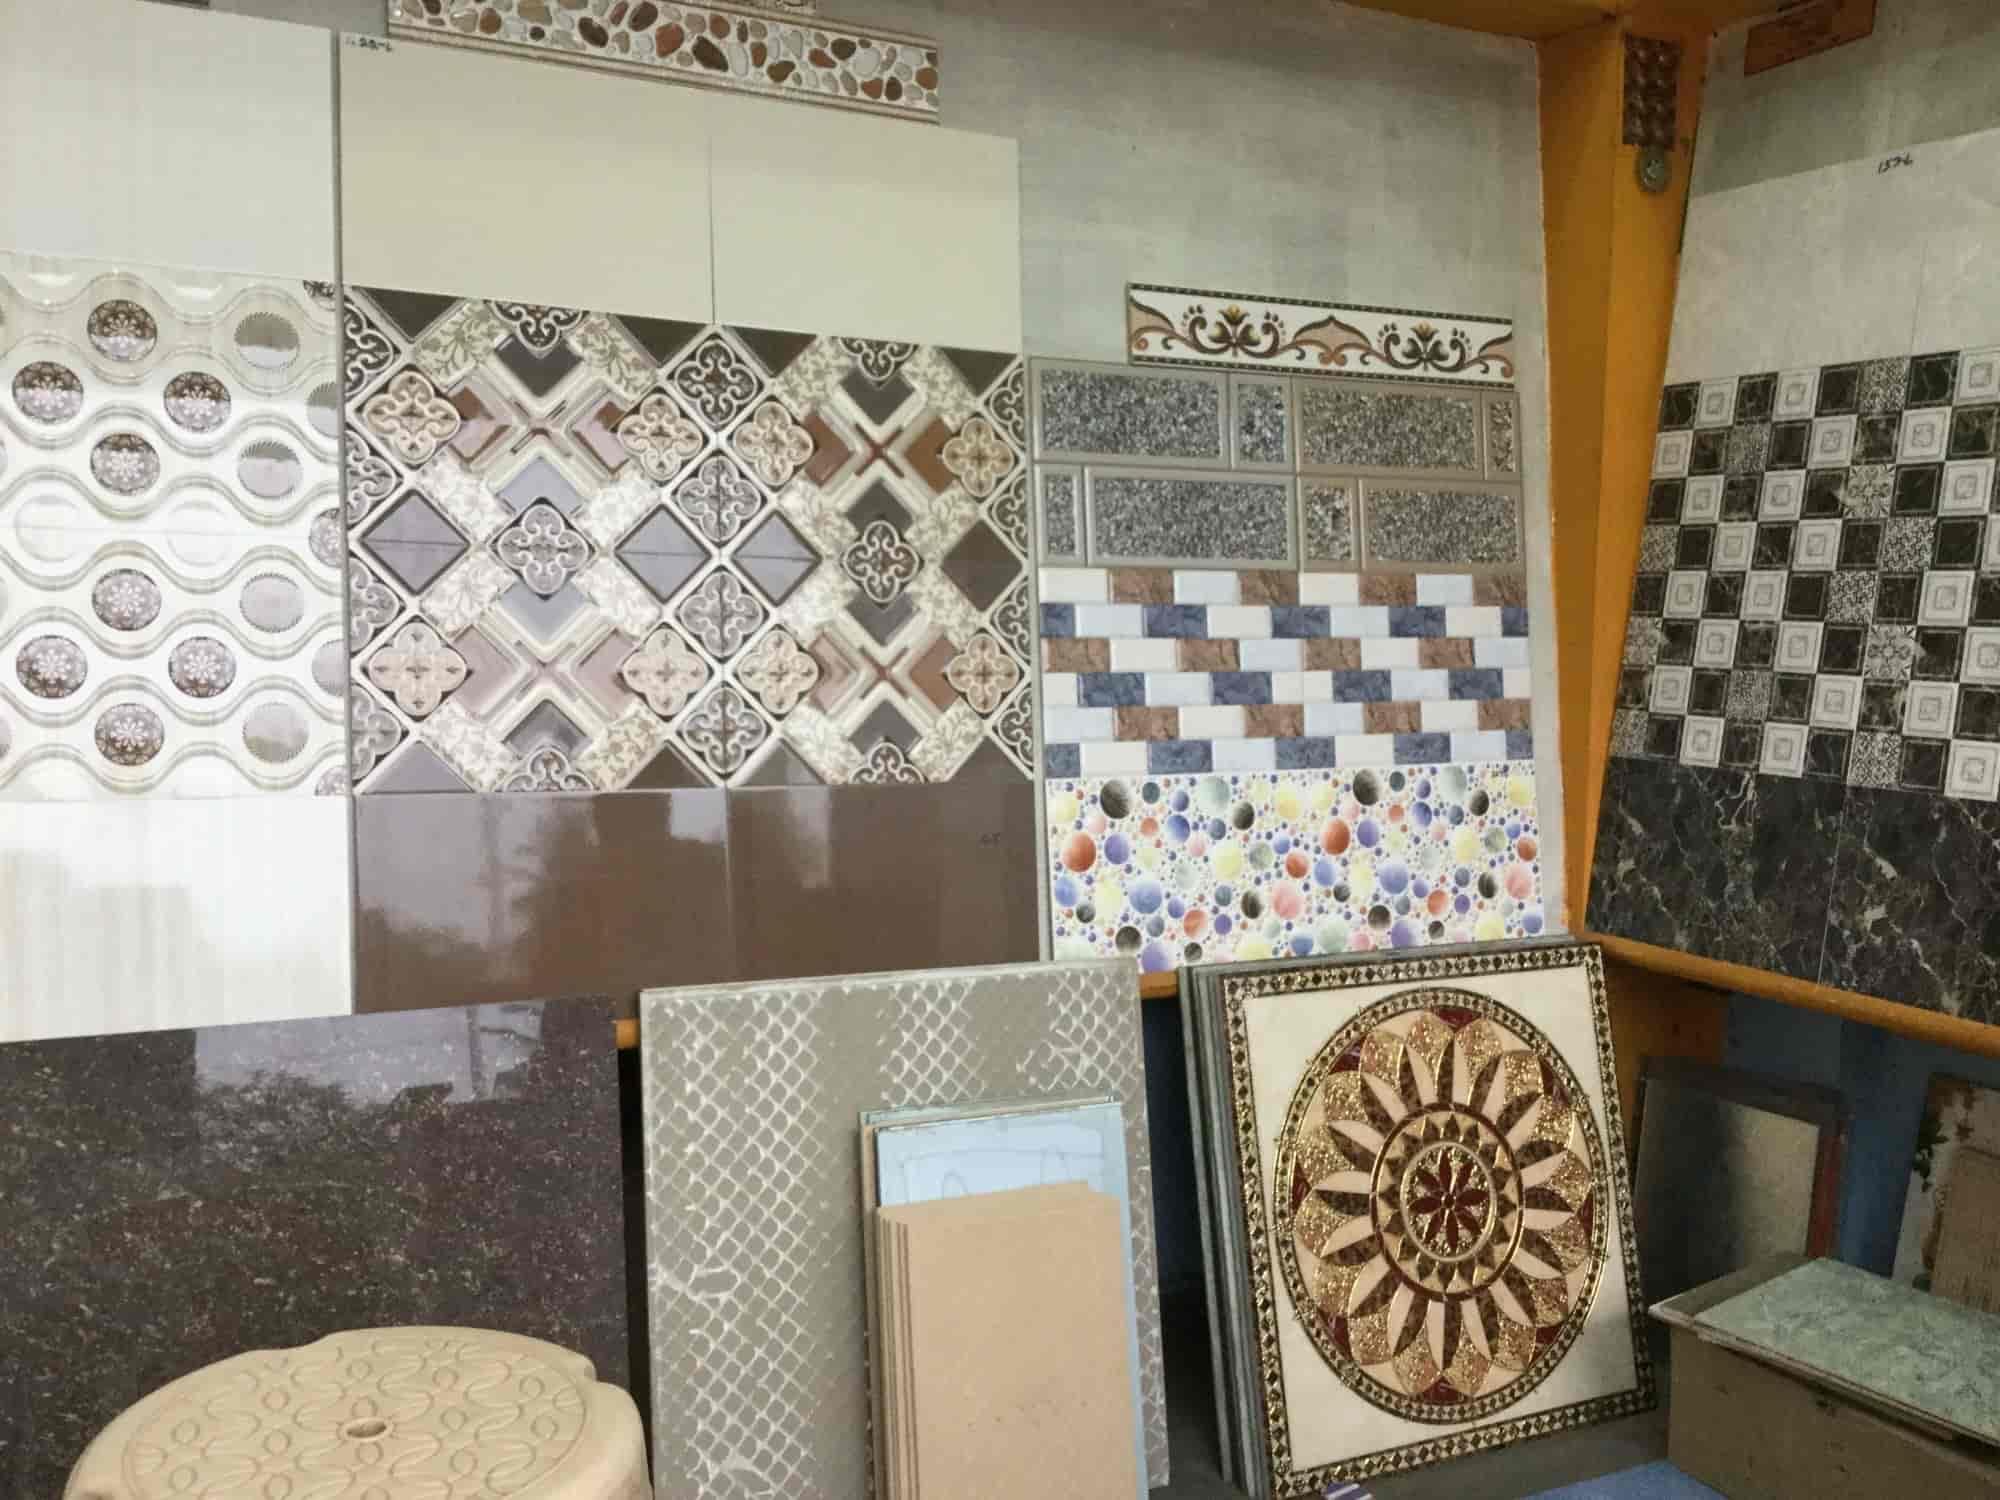 New Star Ceramic Tiles Photos Anantapur Pictures Images - Ceramic tile star designs